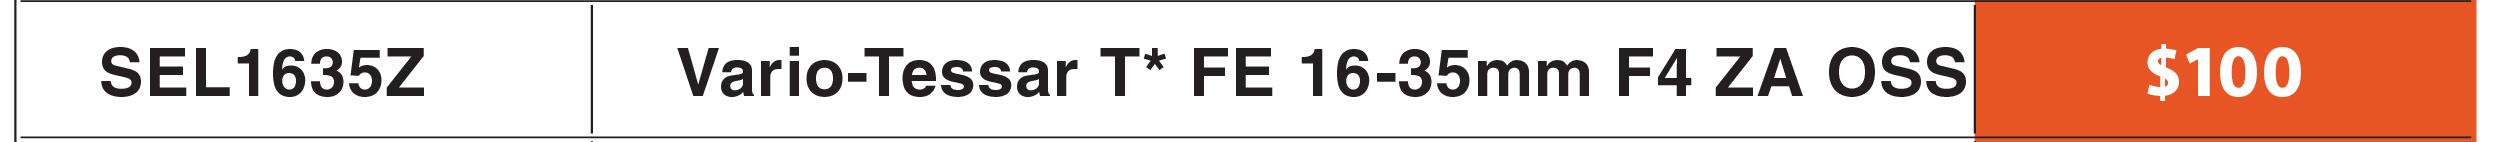 Sony FE 16-35mm f/4